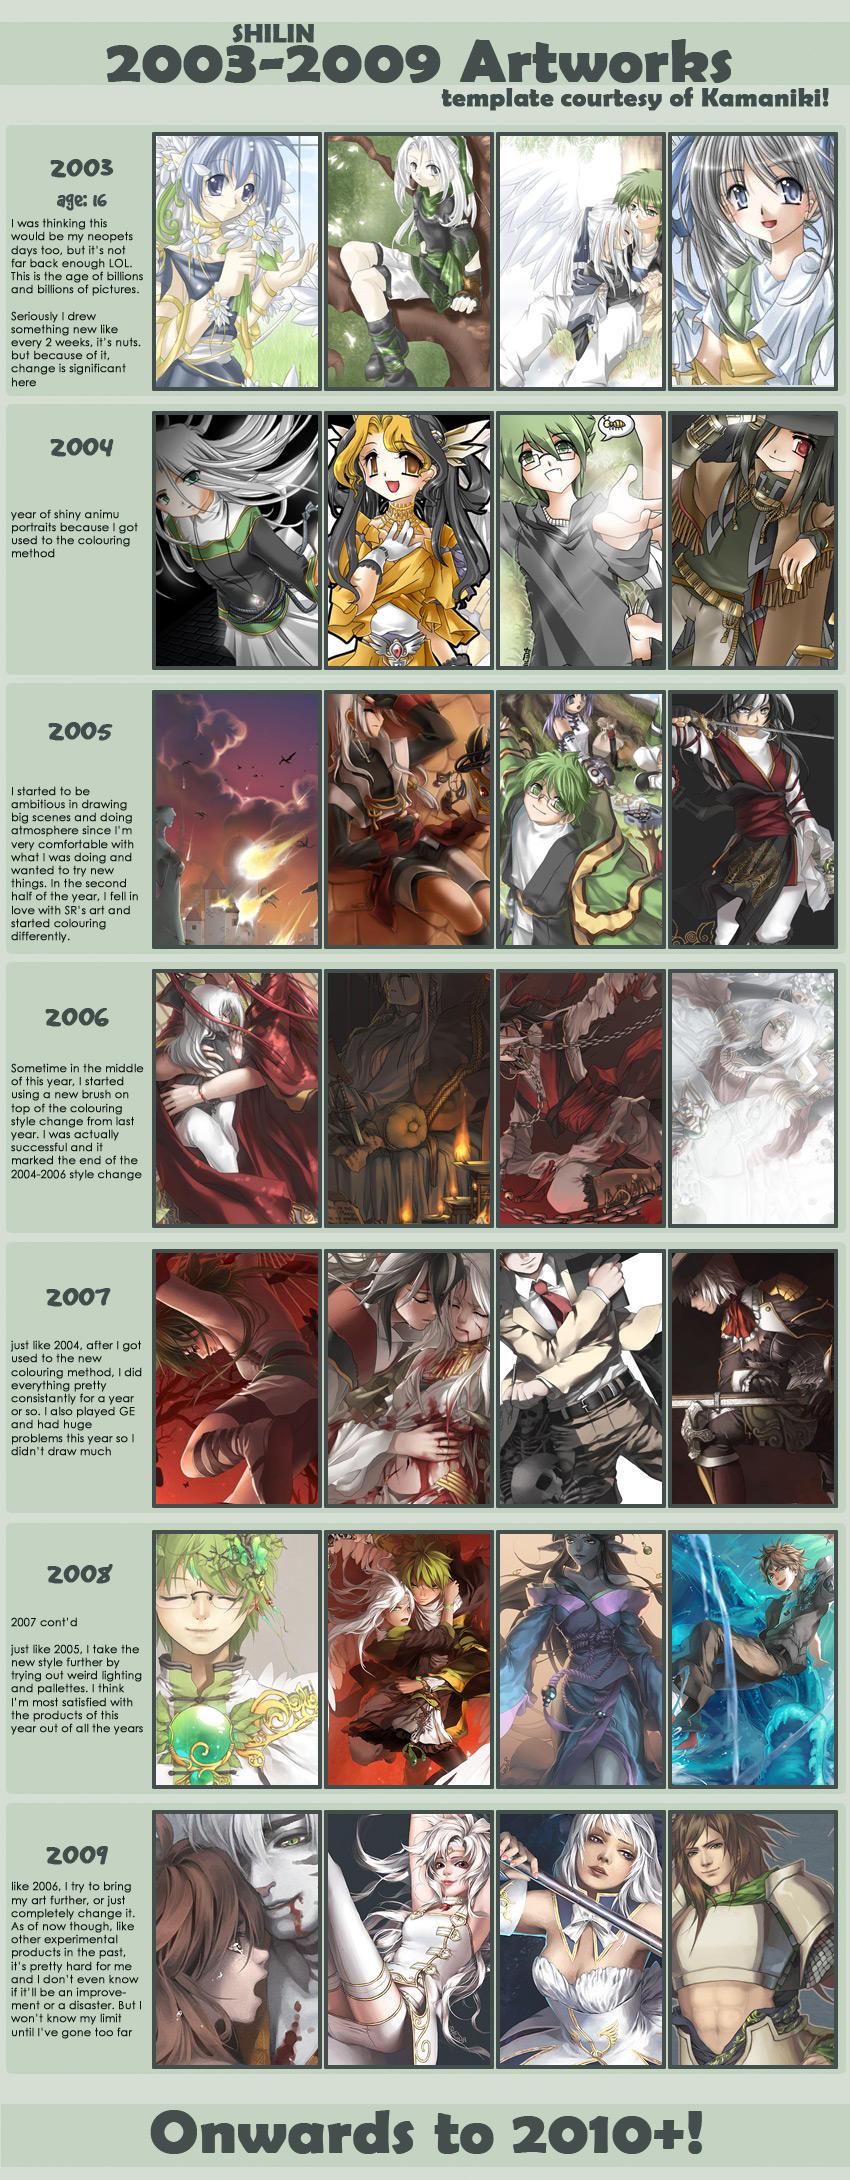 2003-2009 art meme by shilin